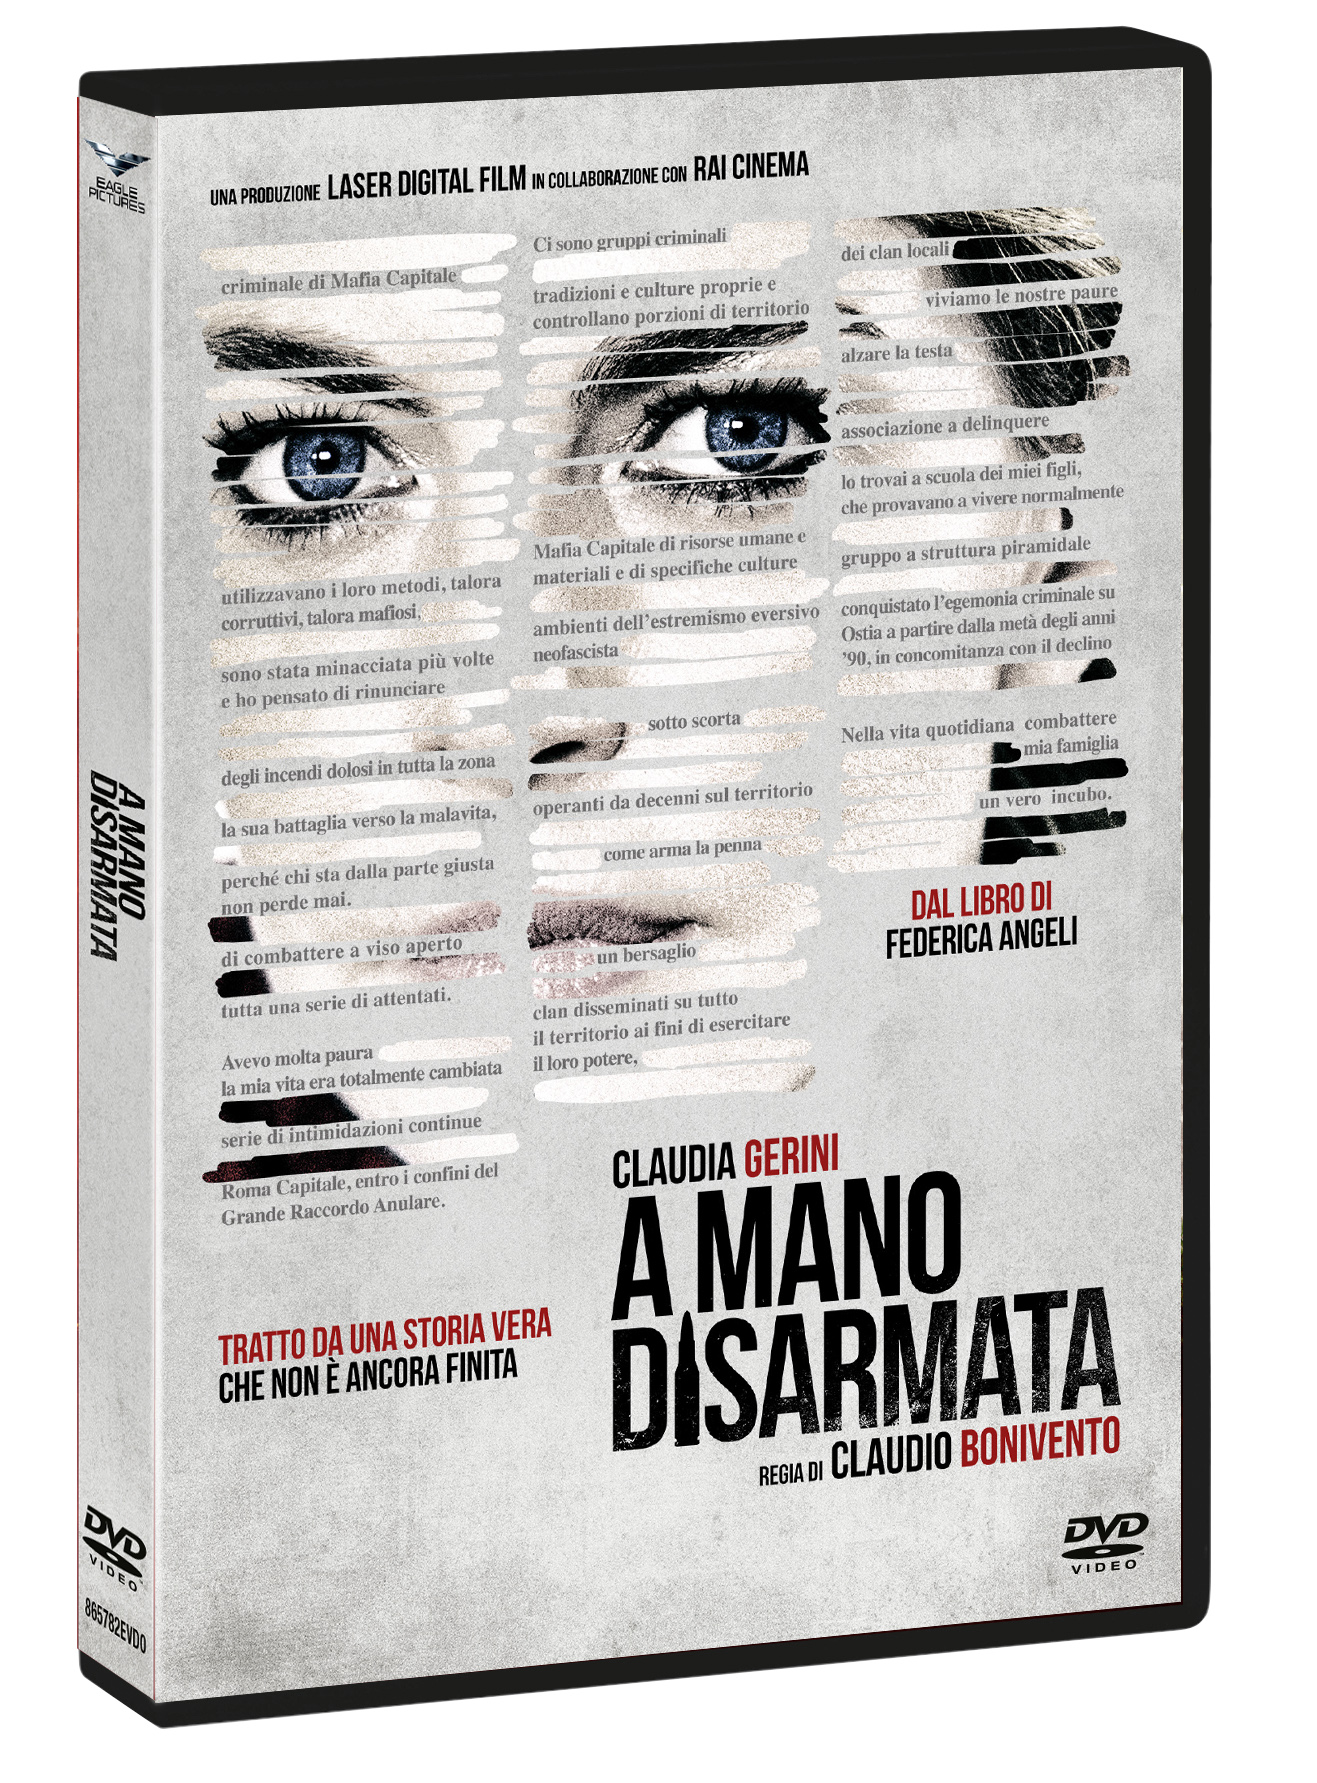 A MANO DISARMATA (DVD)